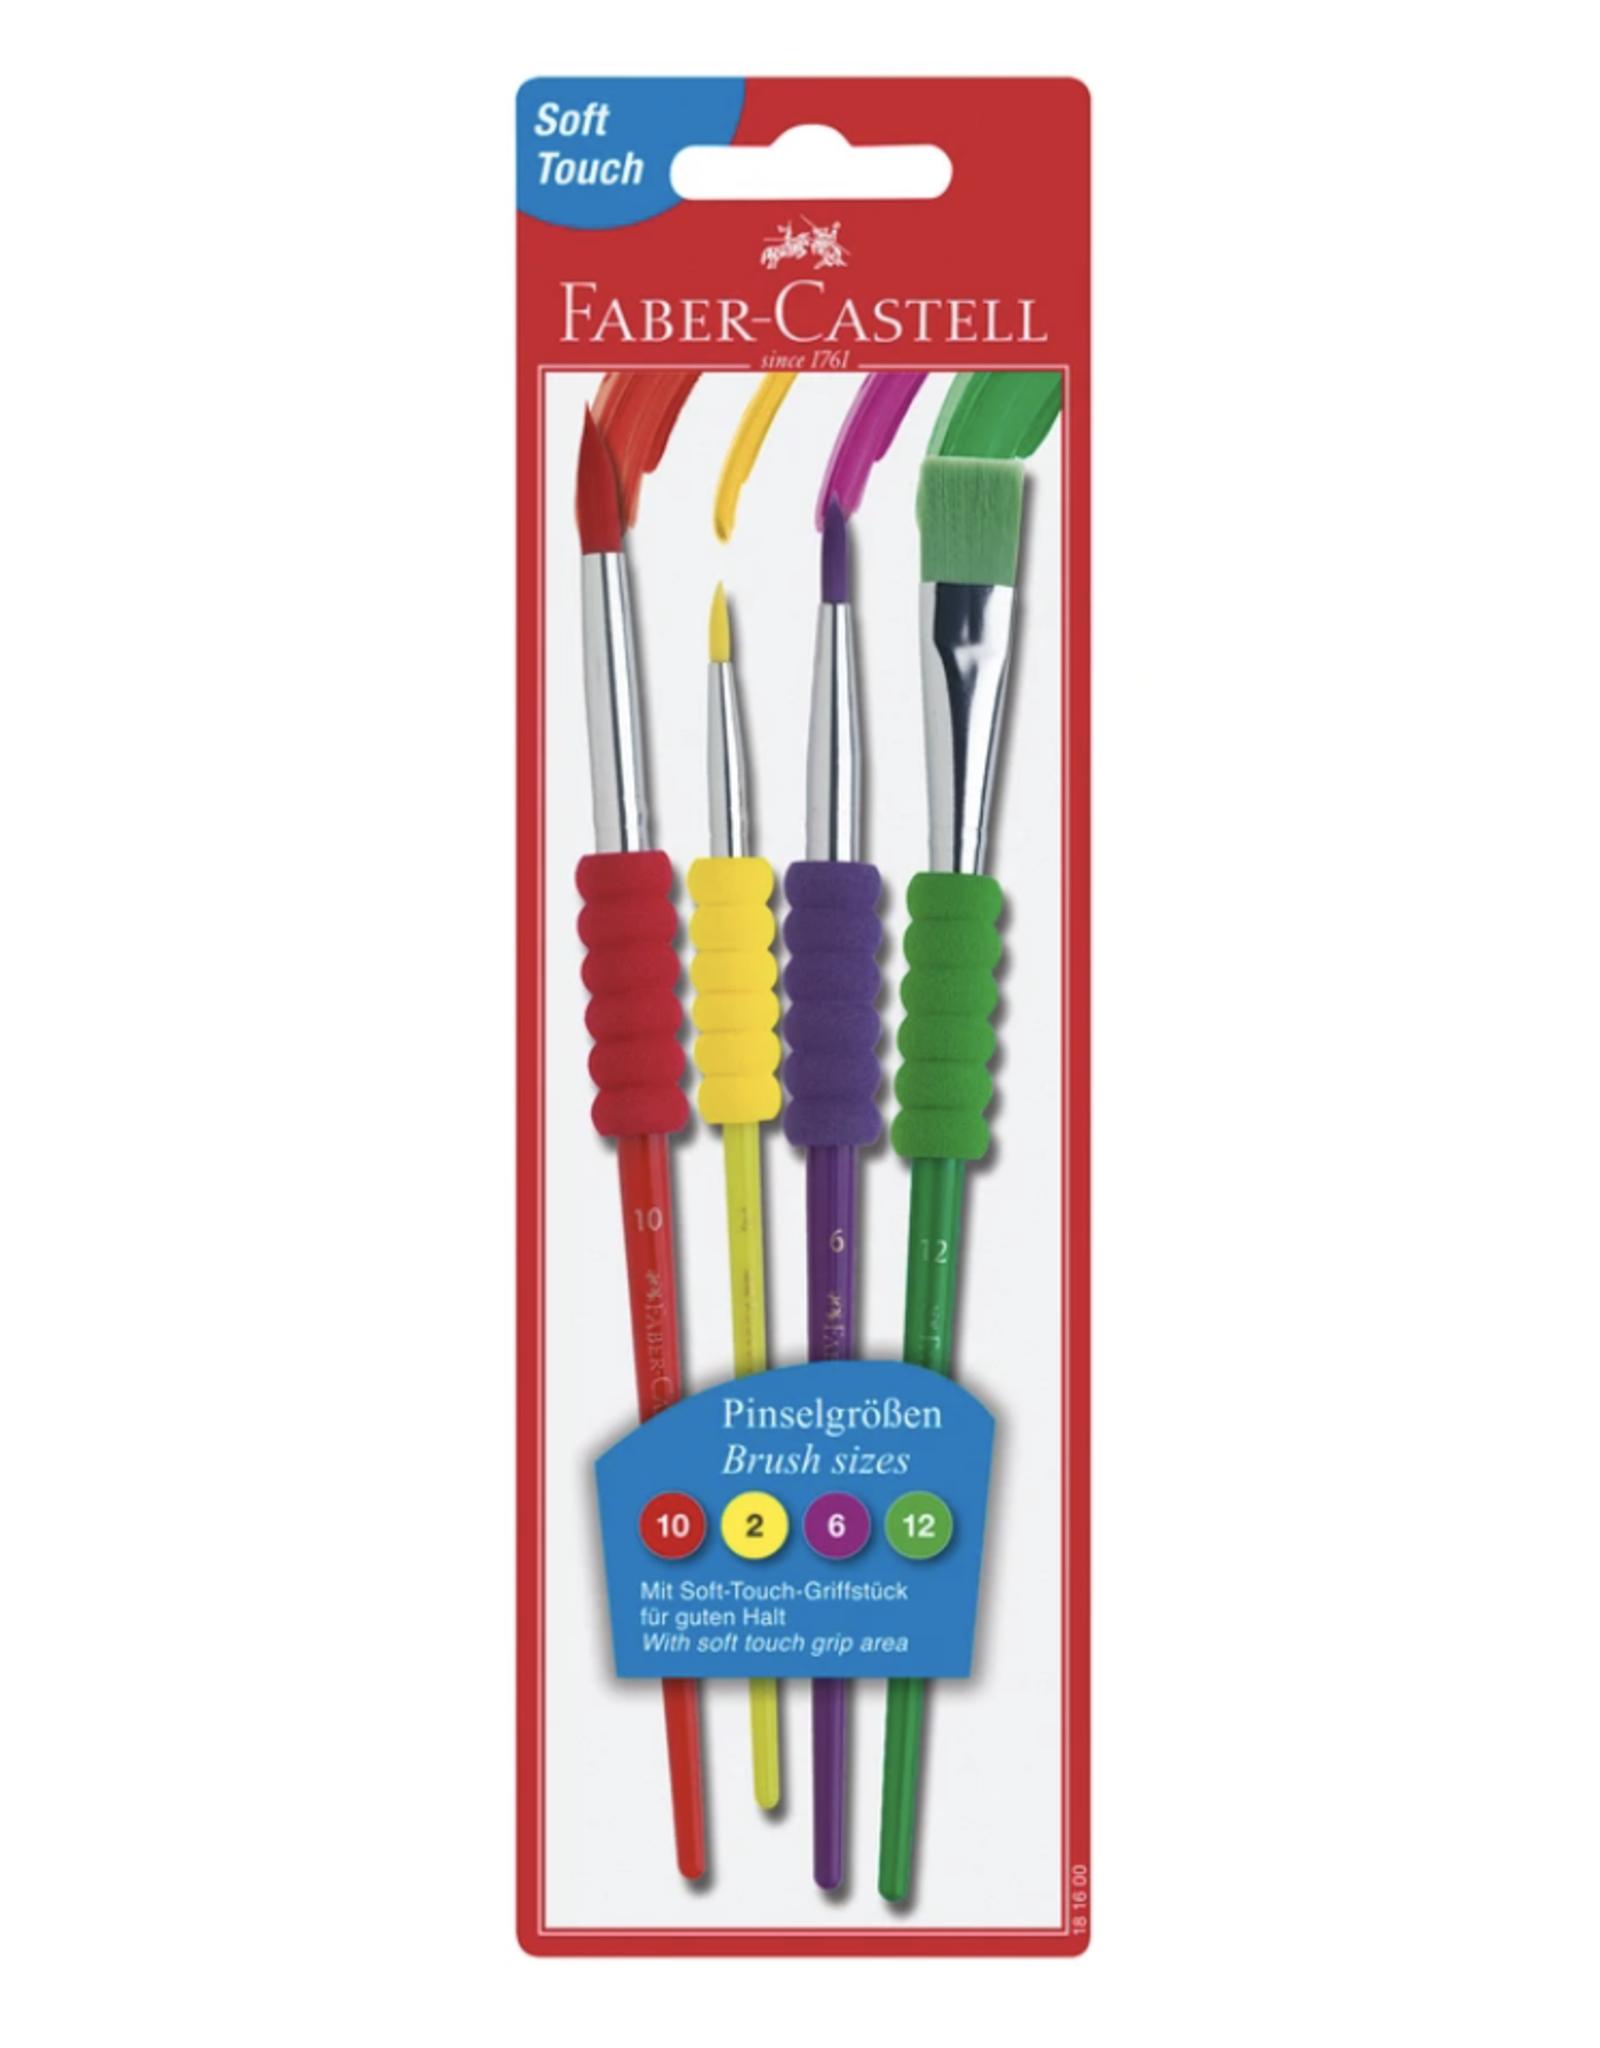 Faber Castell Soft Grip Brushes - 4pk